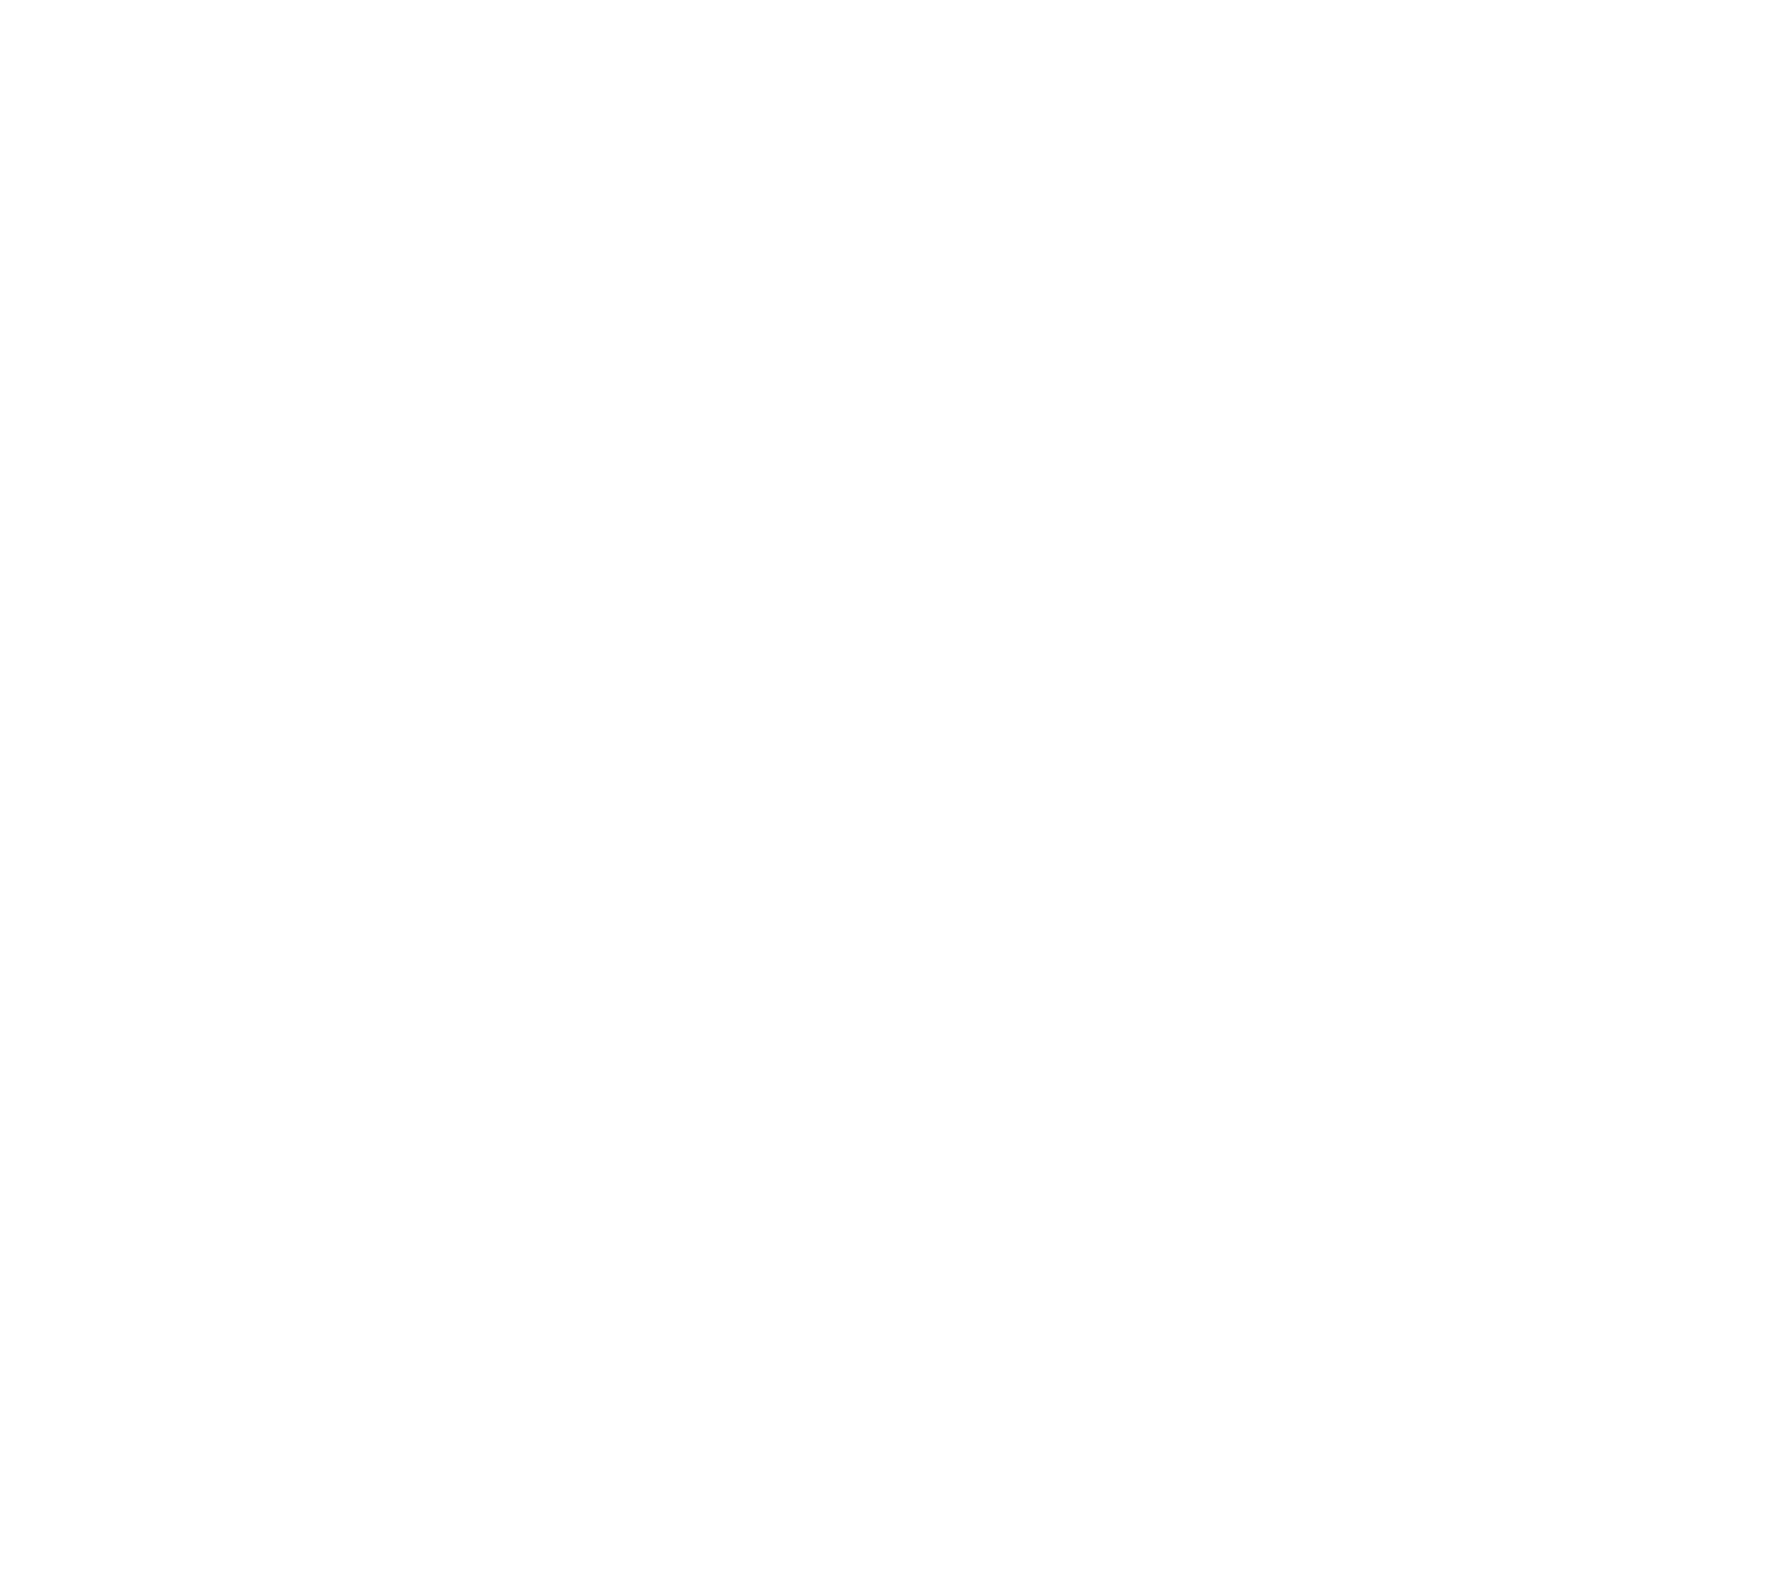 Brown Kiwi nutrition popup